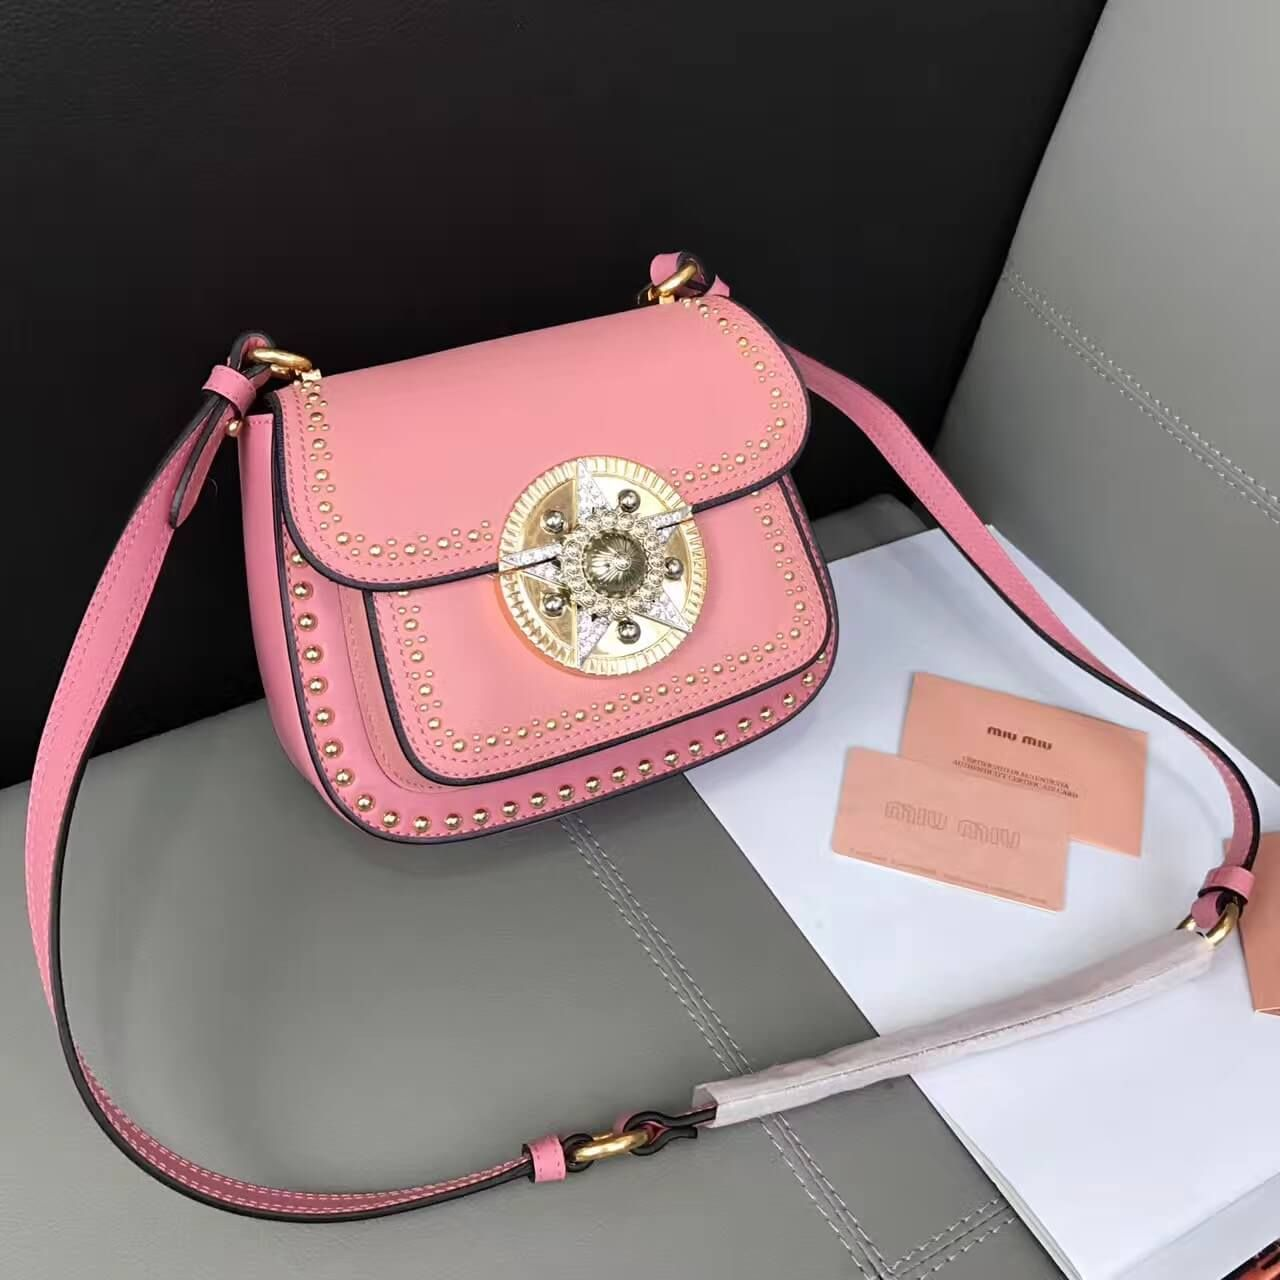 Miu Studs Calfskin Star Lock Shoulder Bag 5bd030 Pink 2017